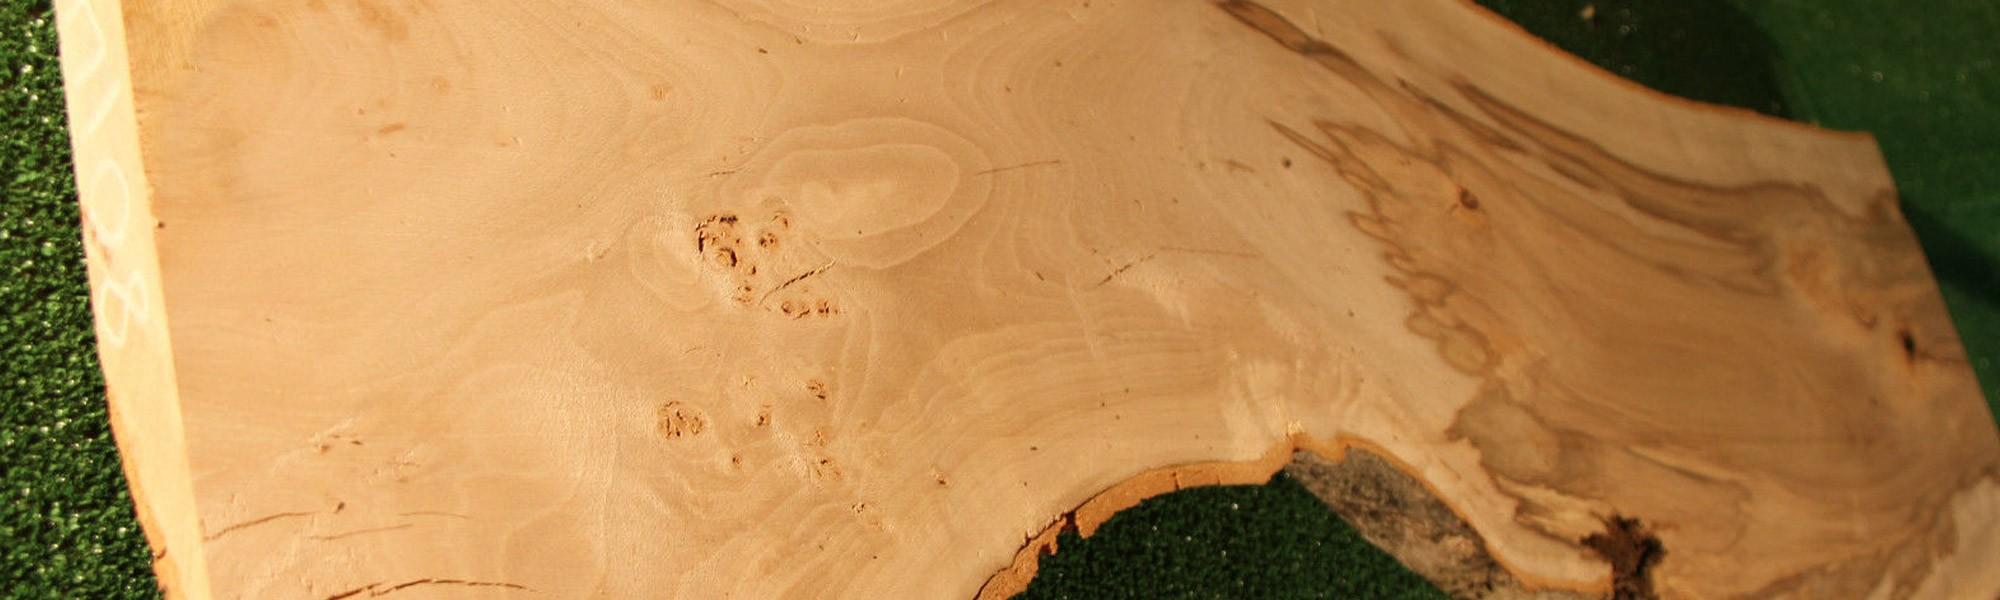 Timber sales on eBay